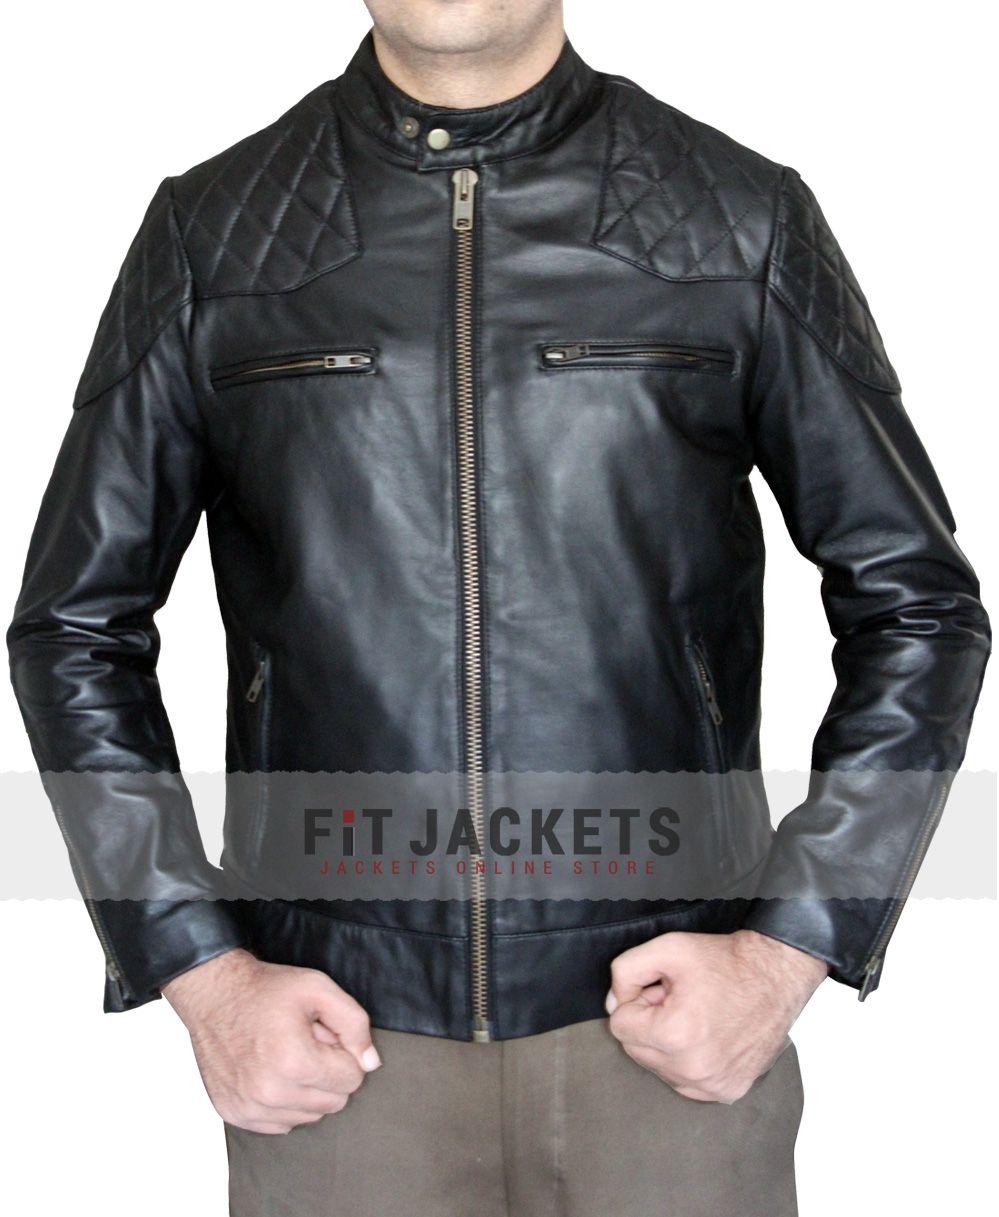 Buy Season 3 Hannibal Jacket for mens . Get Mads Mikkelsen jacket for biker in discounted Price.  #HannibalSeason3 #MadsMikkelsen #Fashion #Stylish #MensOutfit #Shopping #MensFashion #Sale #MensJackets